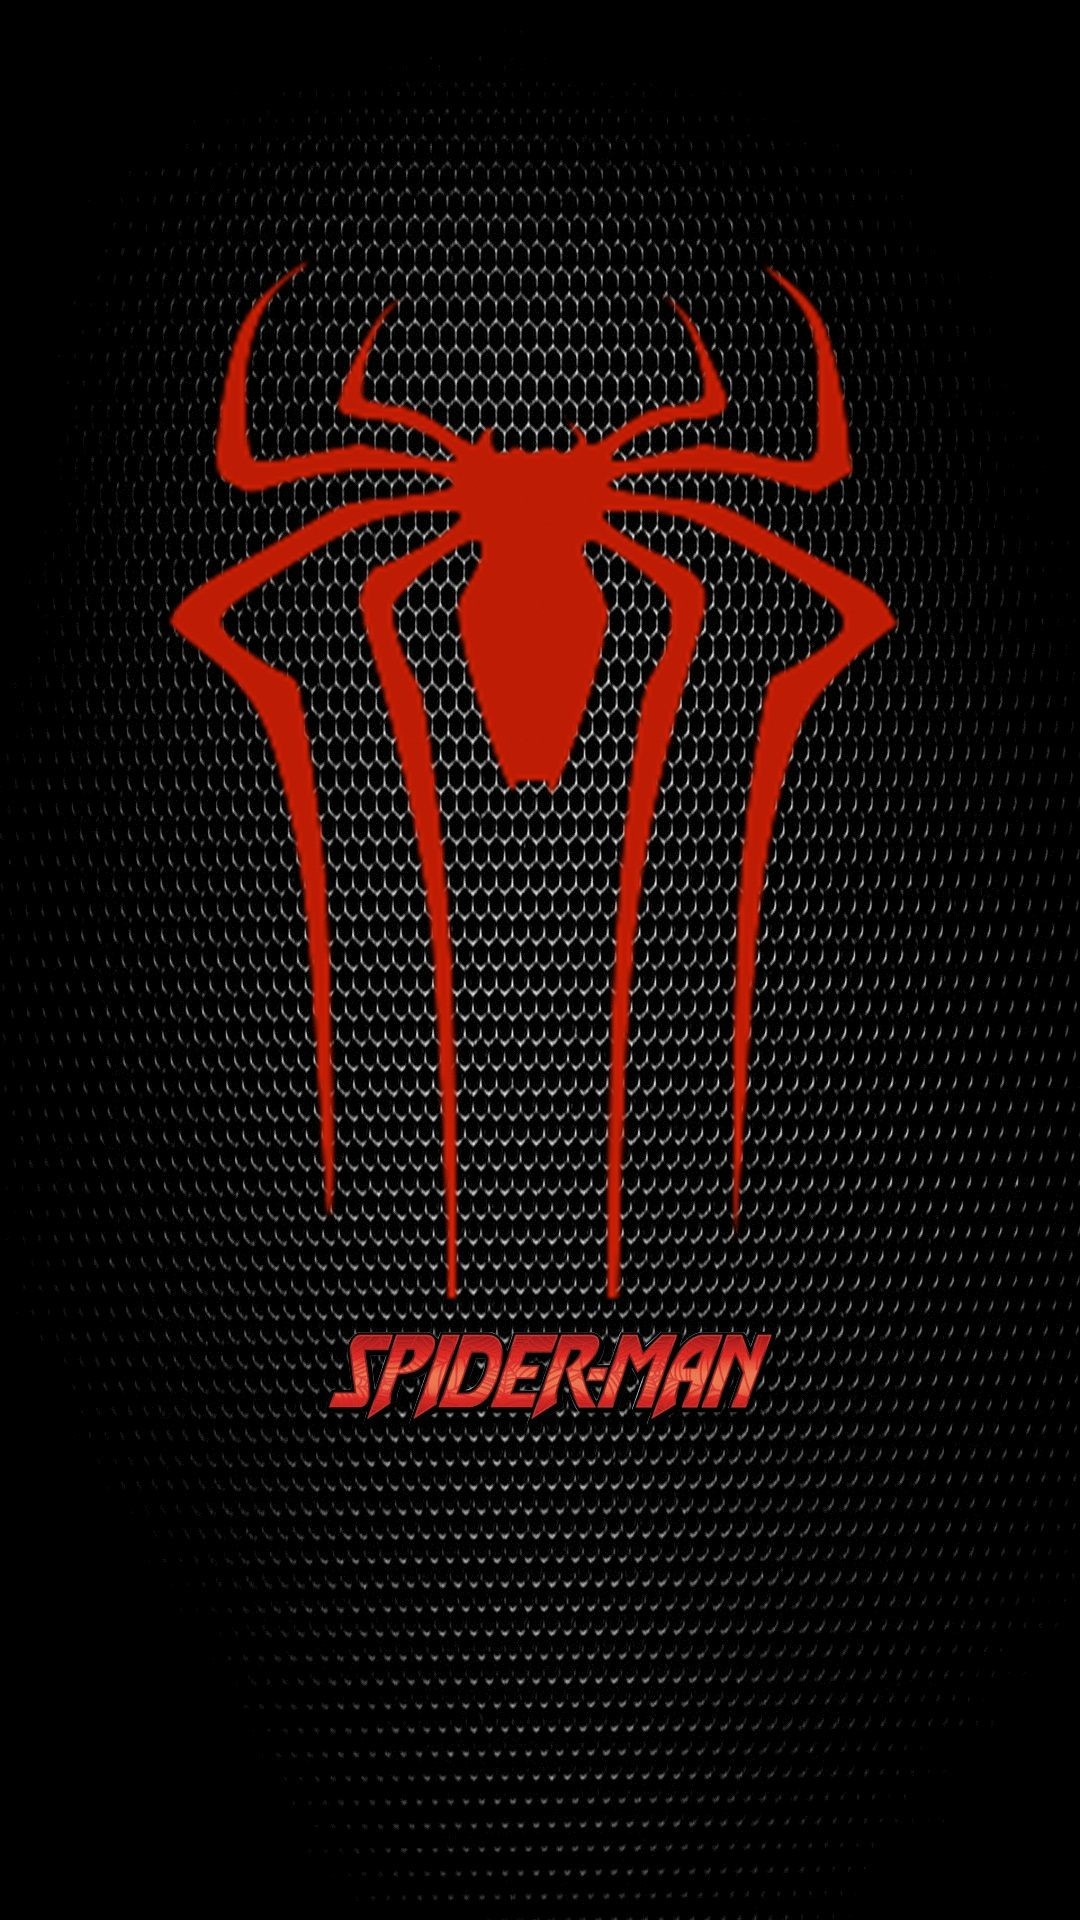 50+ Spider Man iPhone 6 Wallpaper on WallpaperSafari